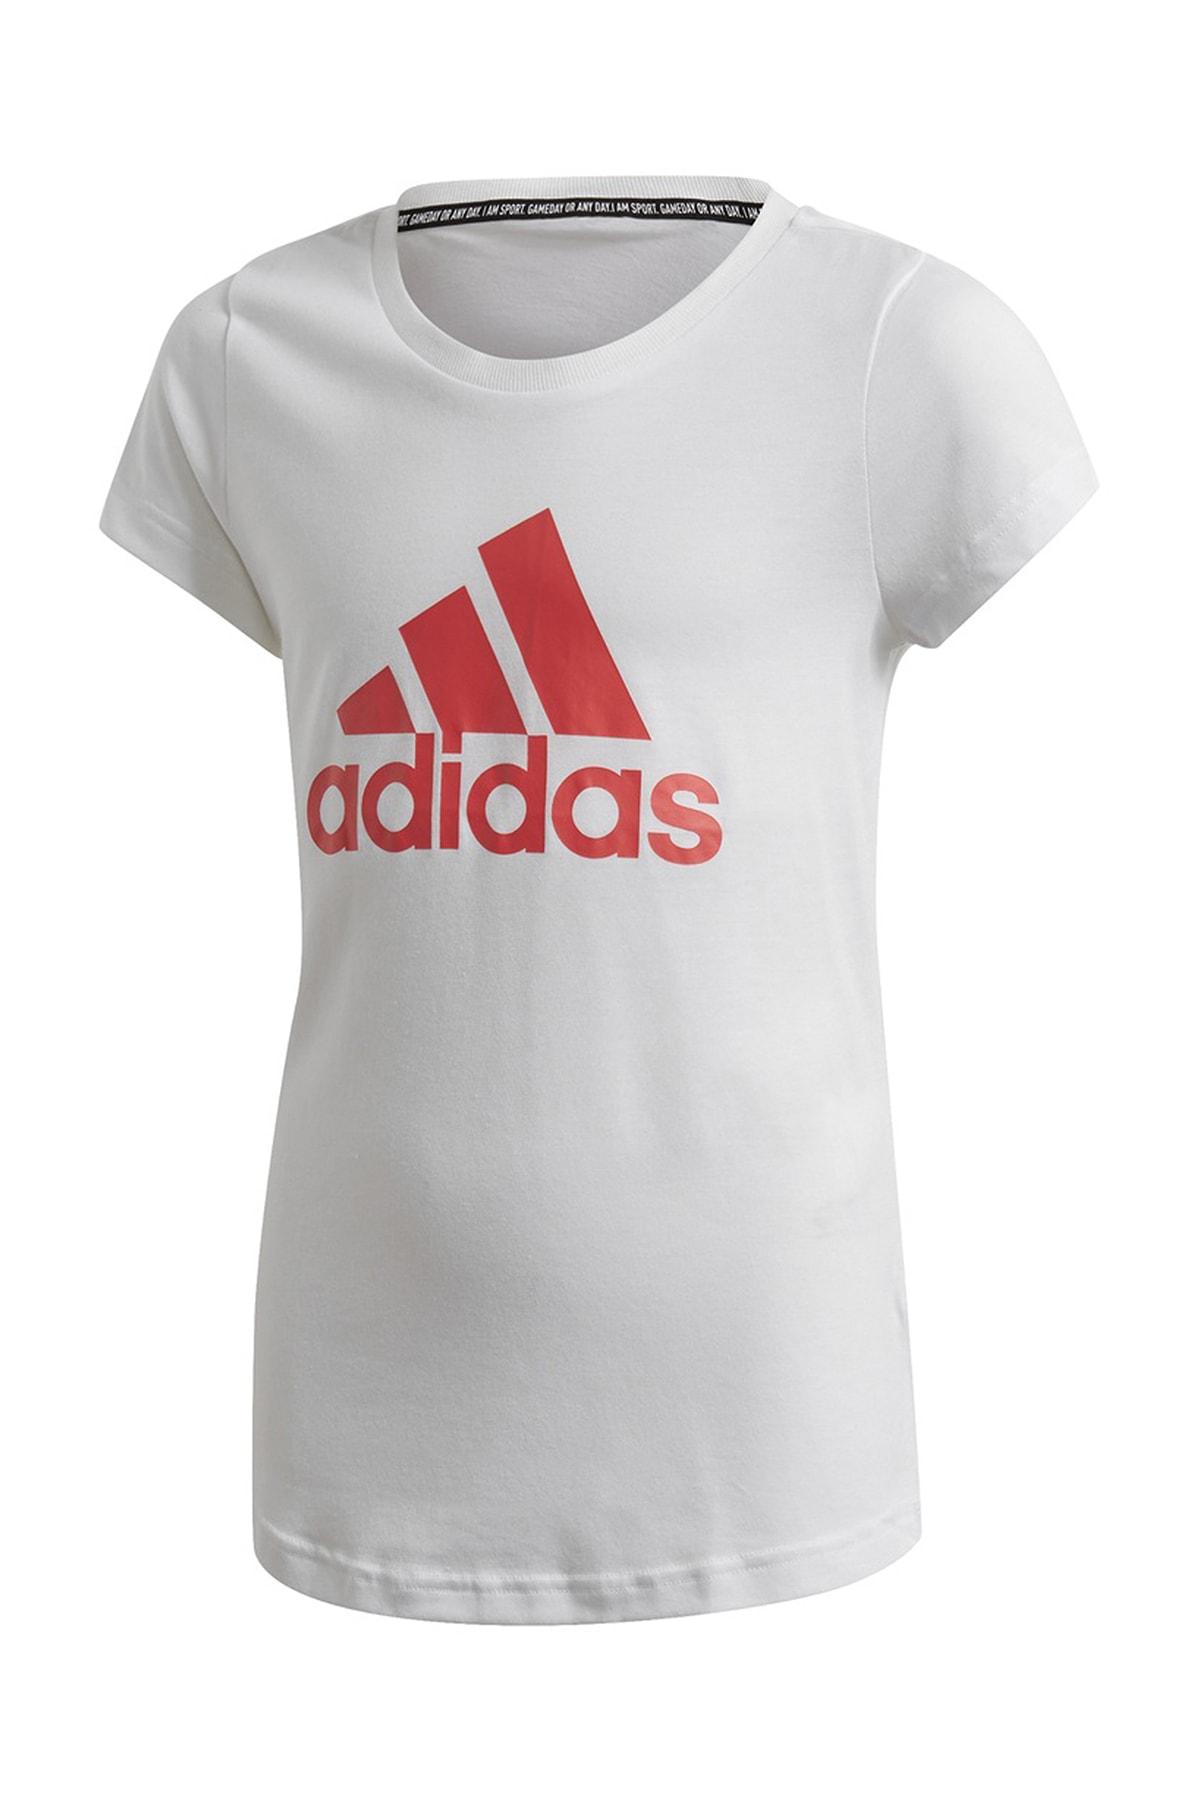 adidas Çocuk Beyaz T-Shirt 0